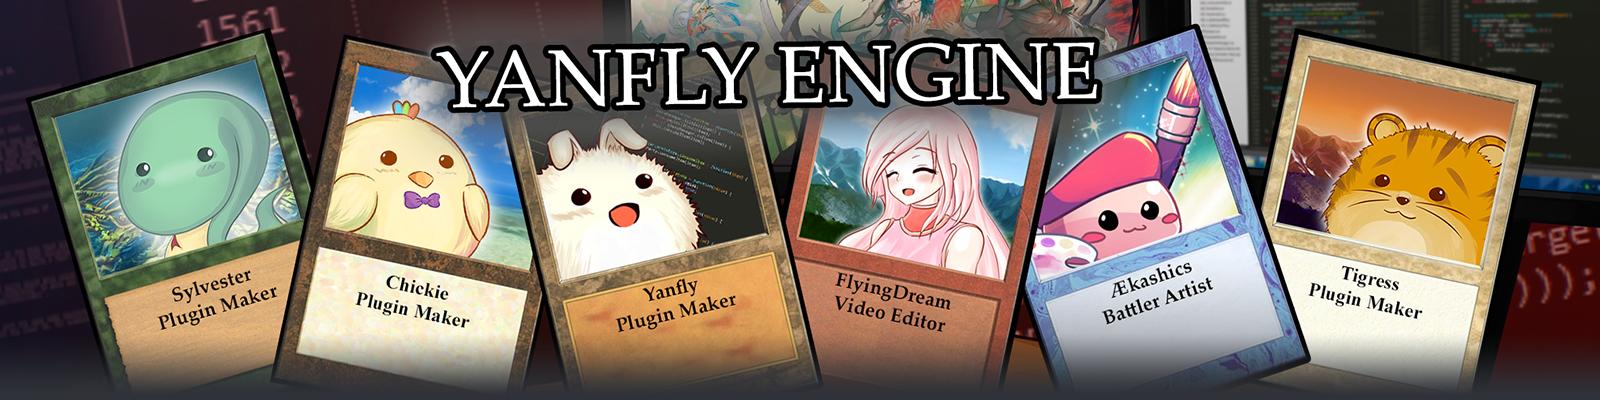 Yanfly Engine Plugins - itch io